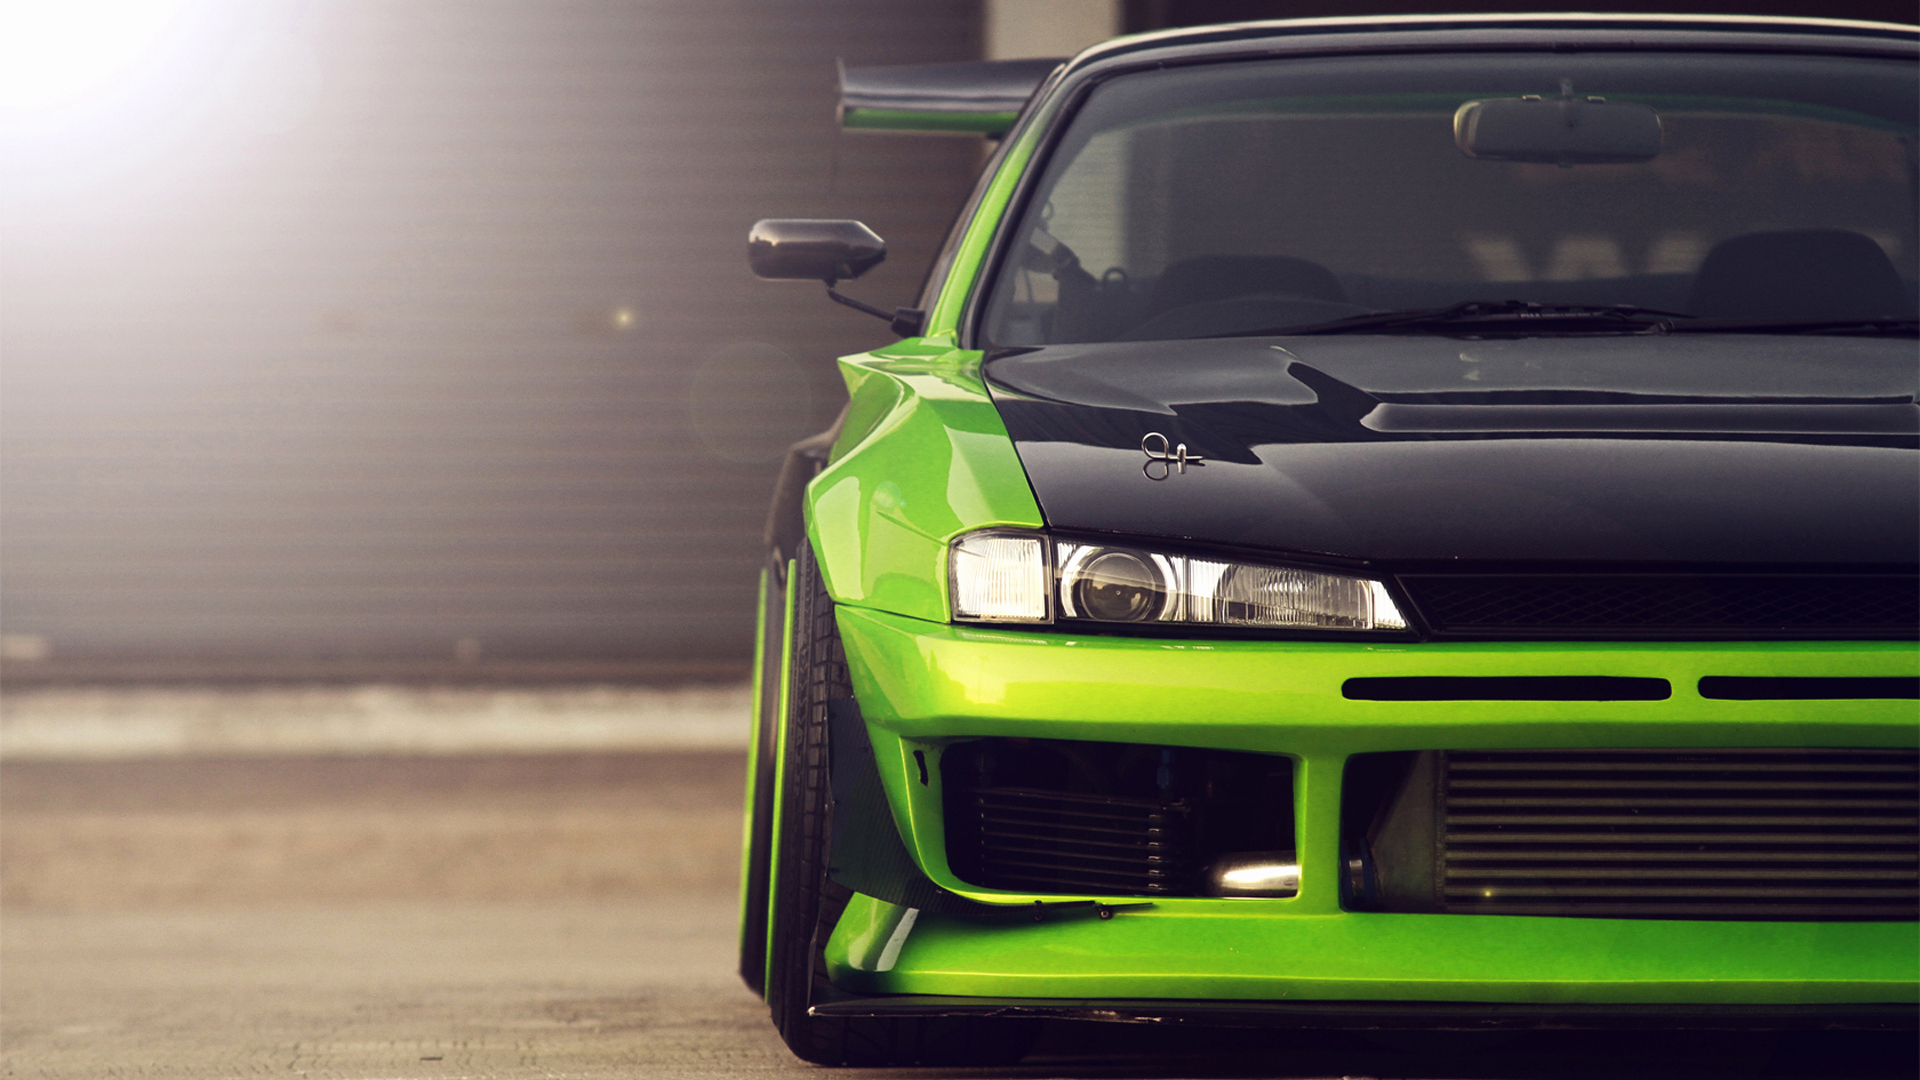 1920x1080 subaru wrx sti jdm crystal city car 2014 green neon hd wallpapers. Jdm Cars Wallpapers Posted By Ryan Simpson